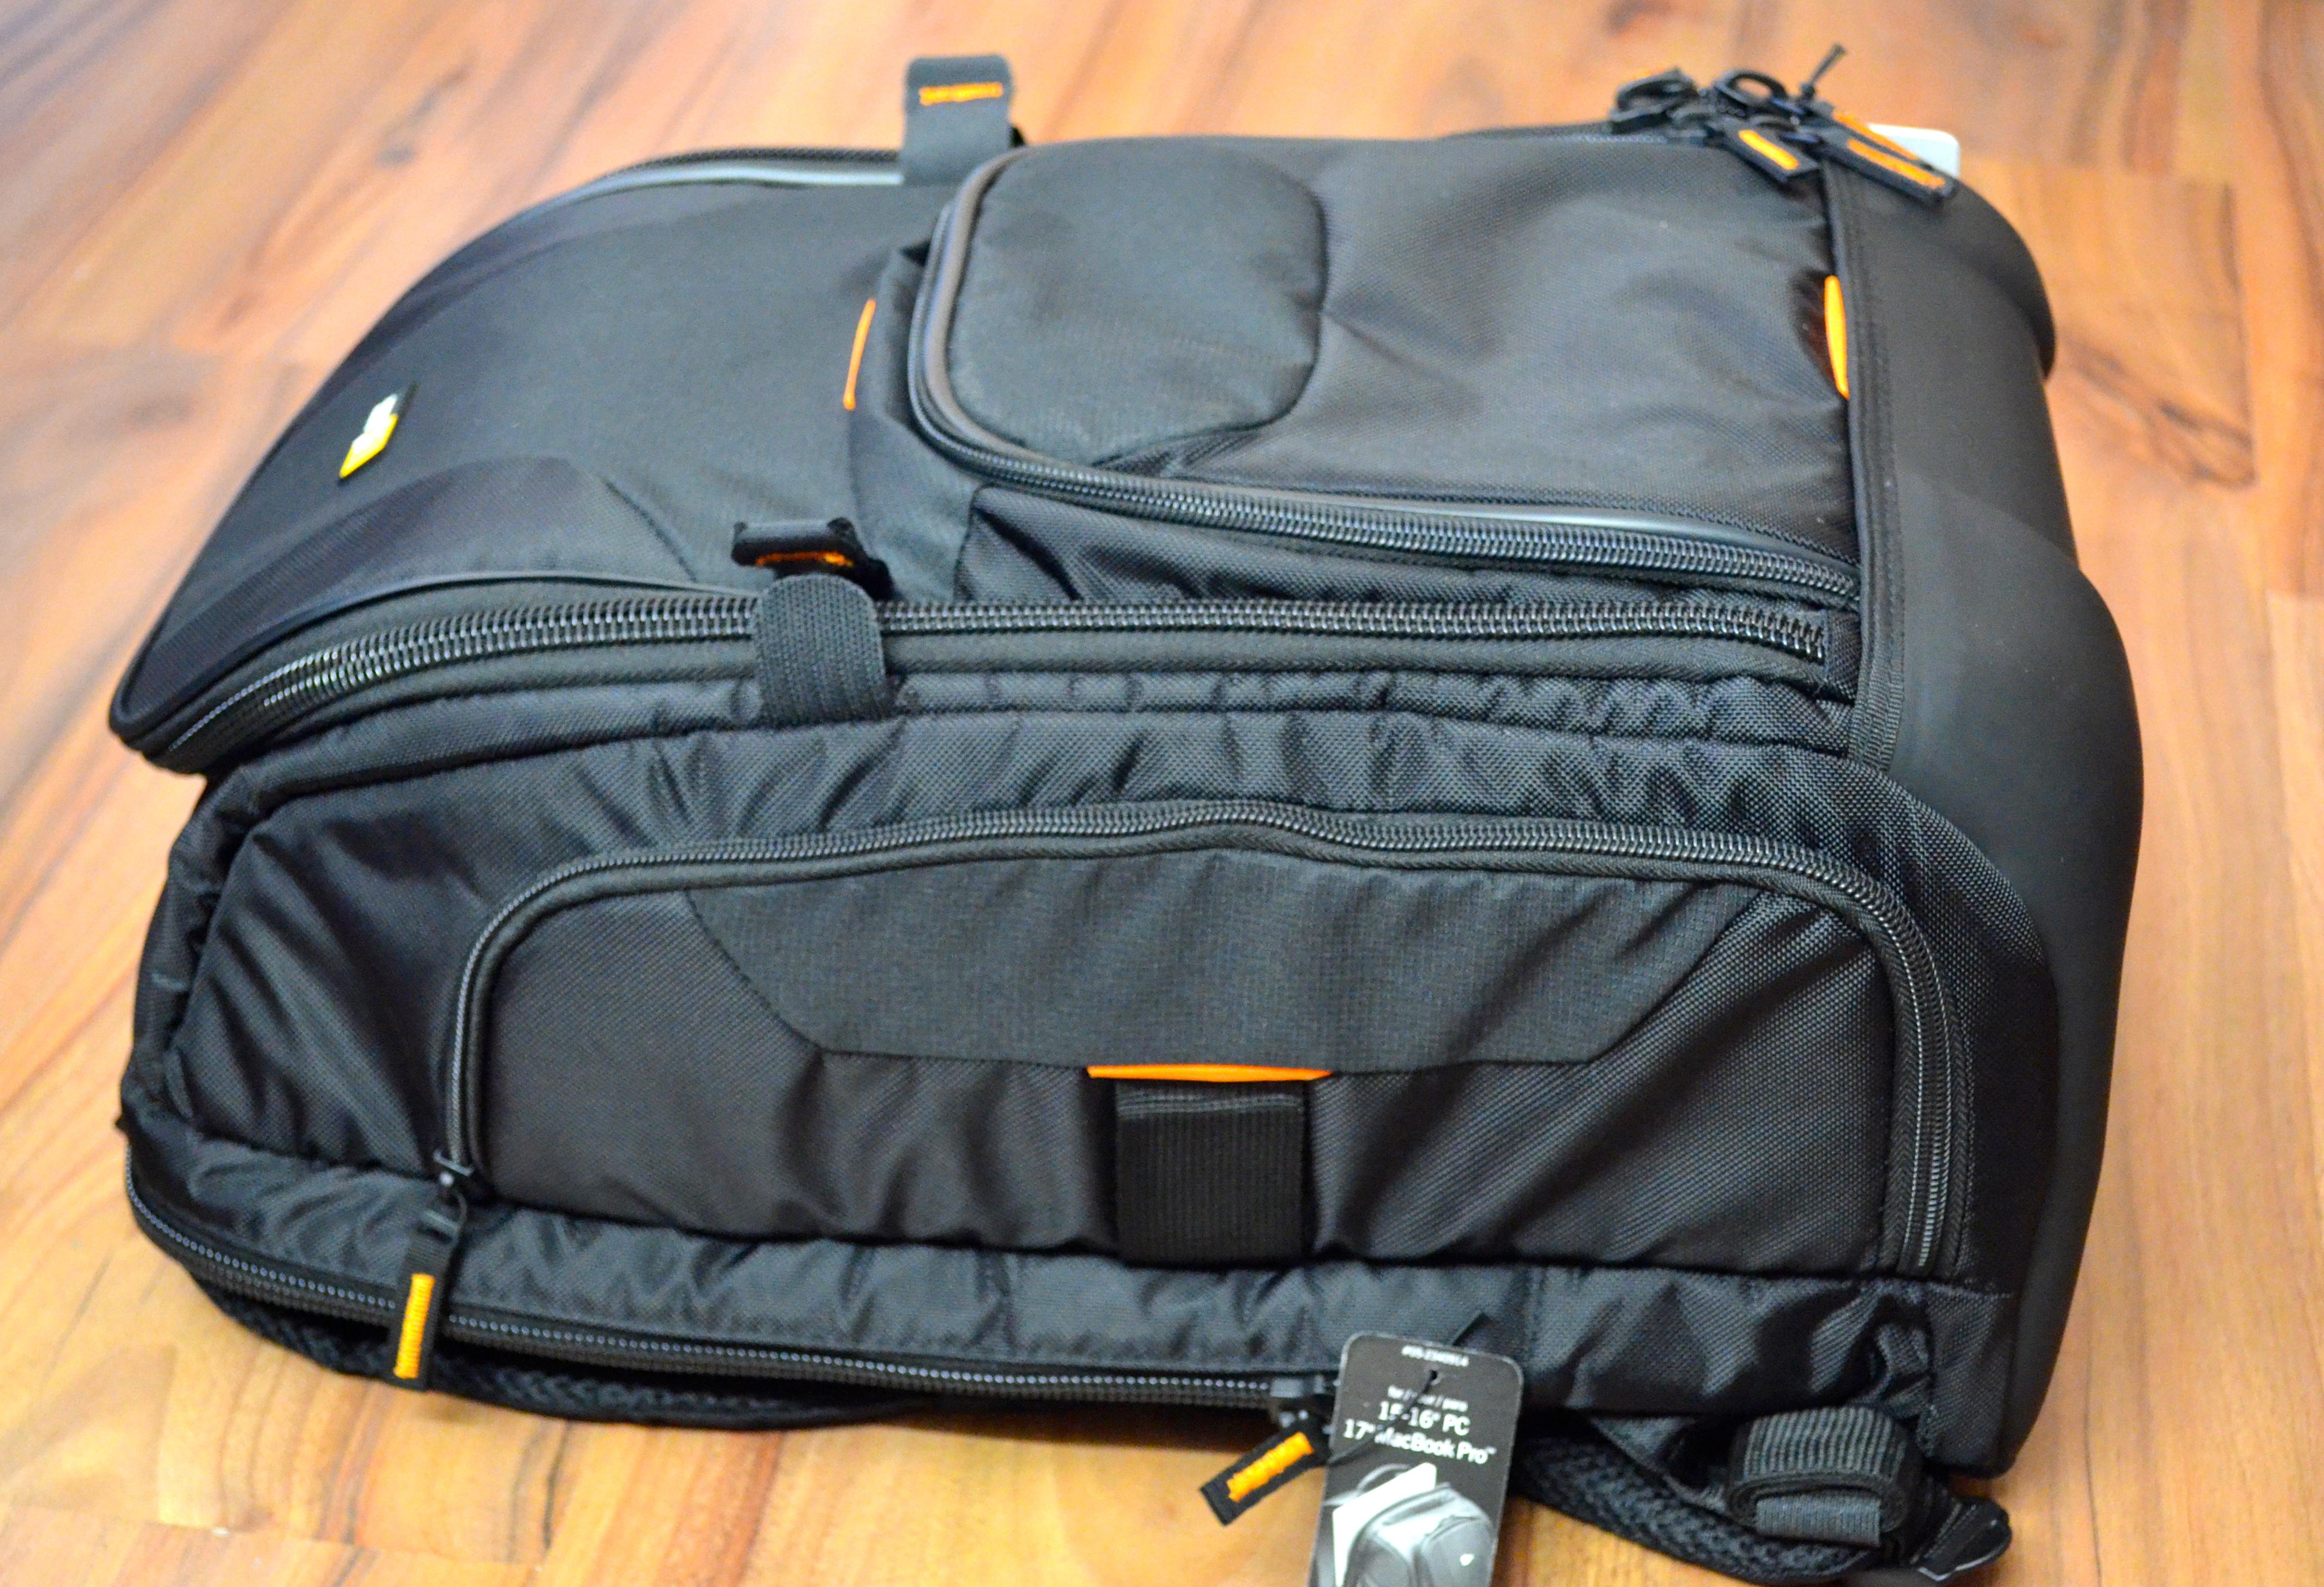 Camera Dslr Camera Bags Review case logic slrc 206 cameralaptop bag review camera bag